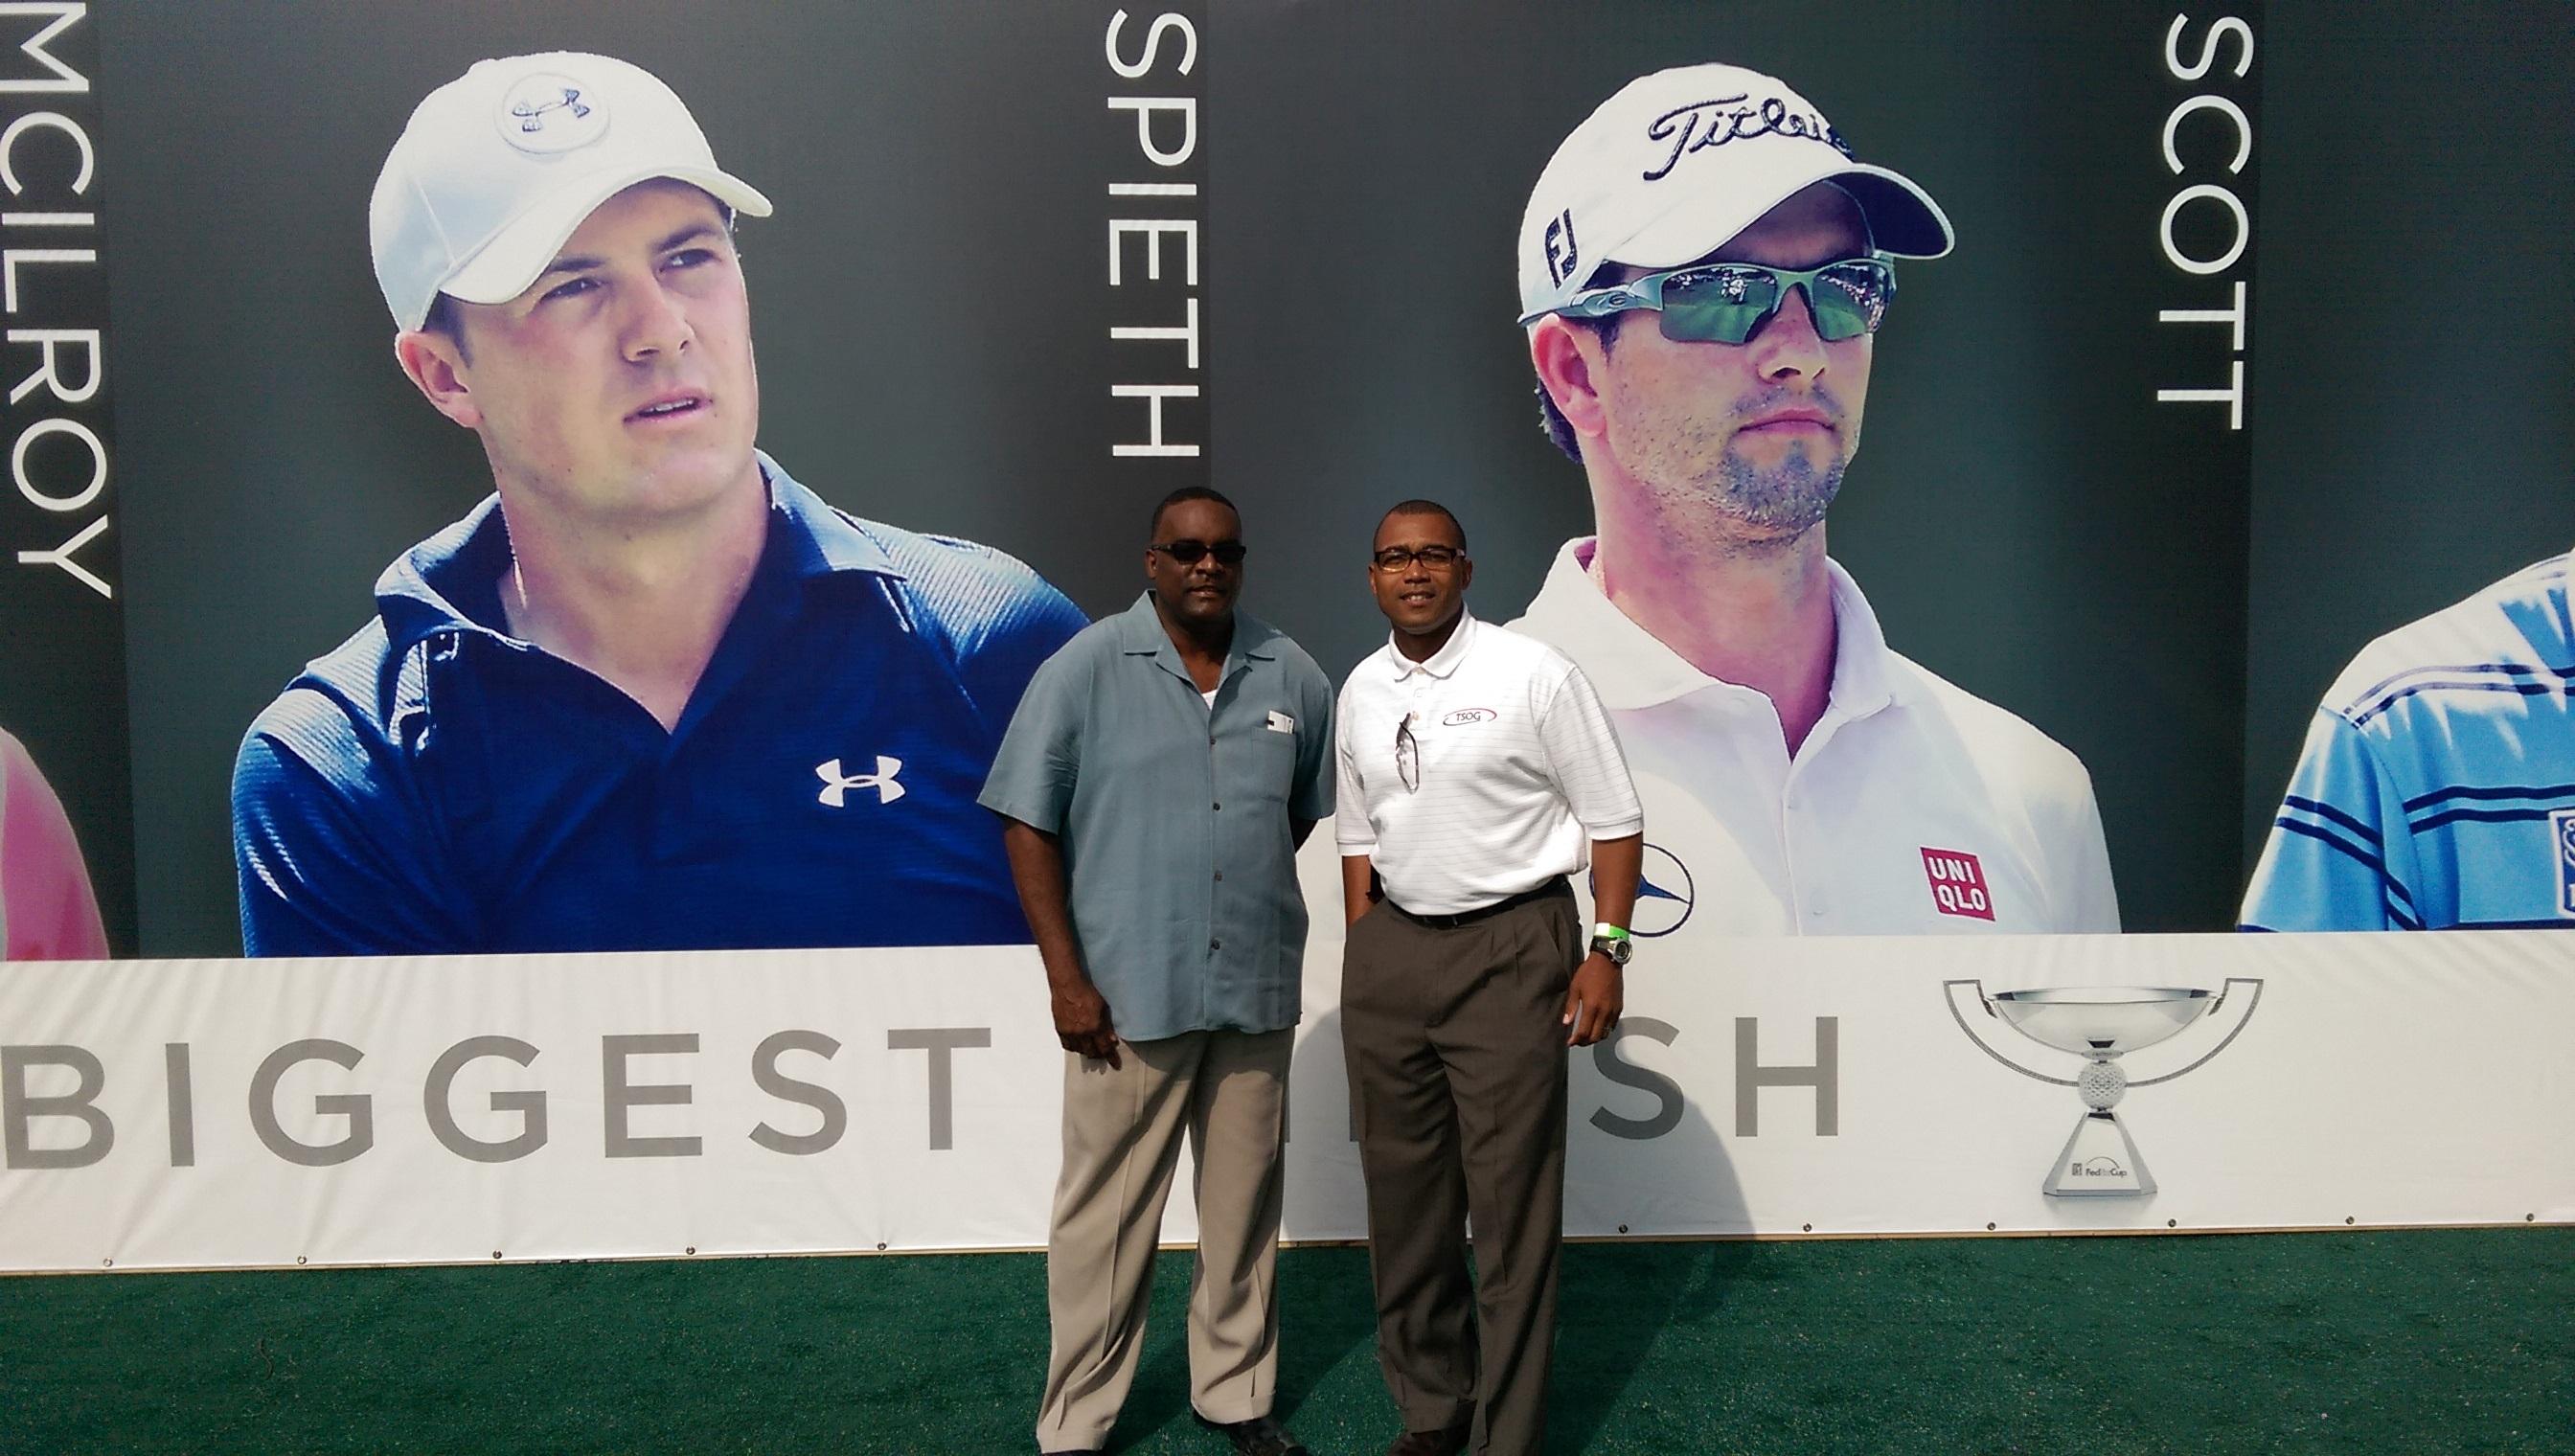 East Lake Golf Tournament Event- McAfee Sponsored